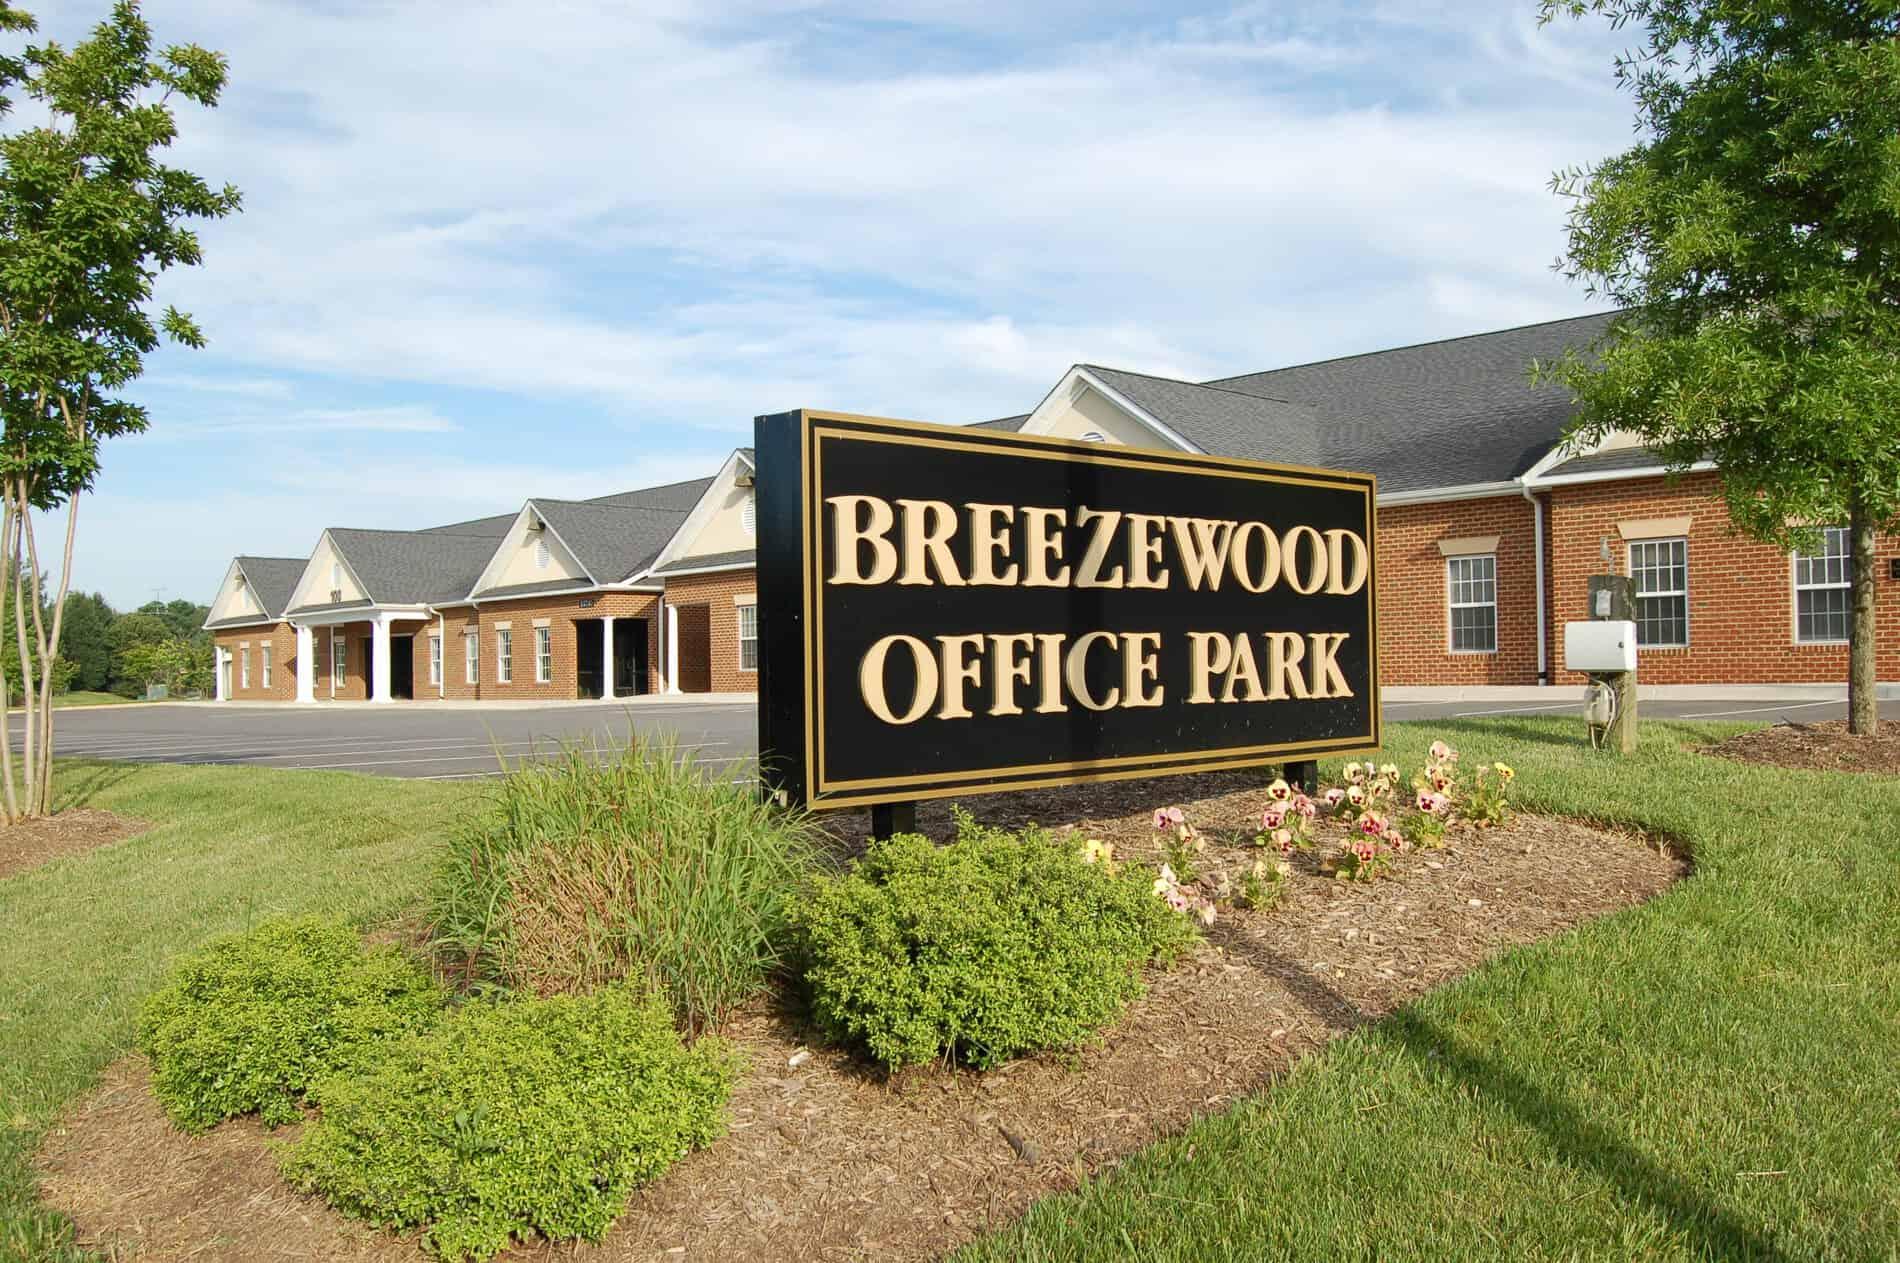 Commercial Property Realtor Fredericksburg